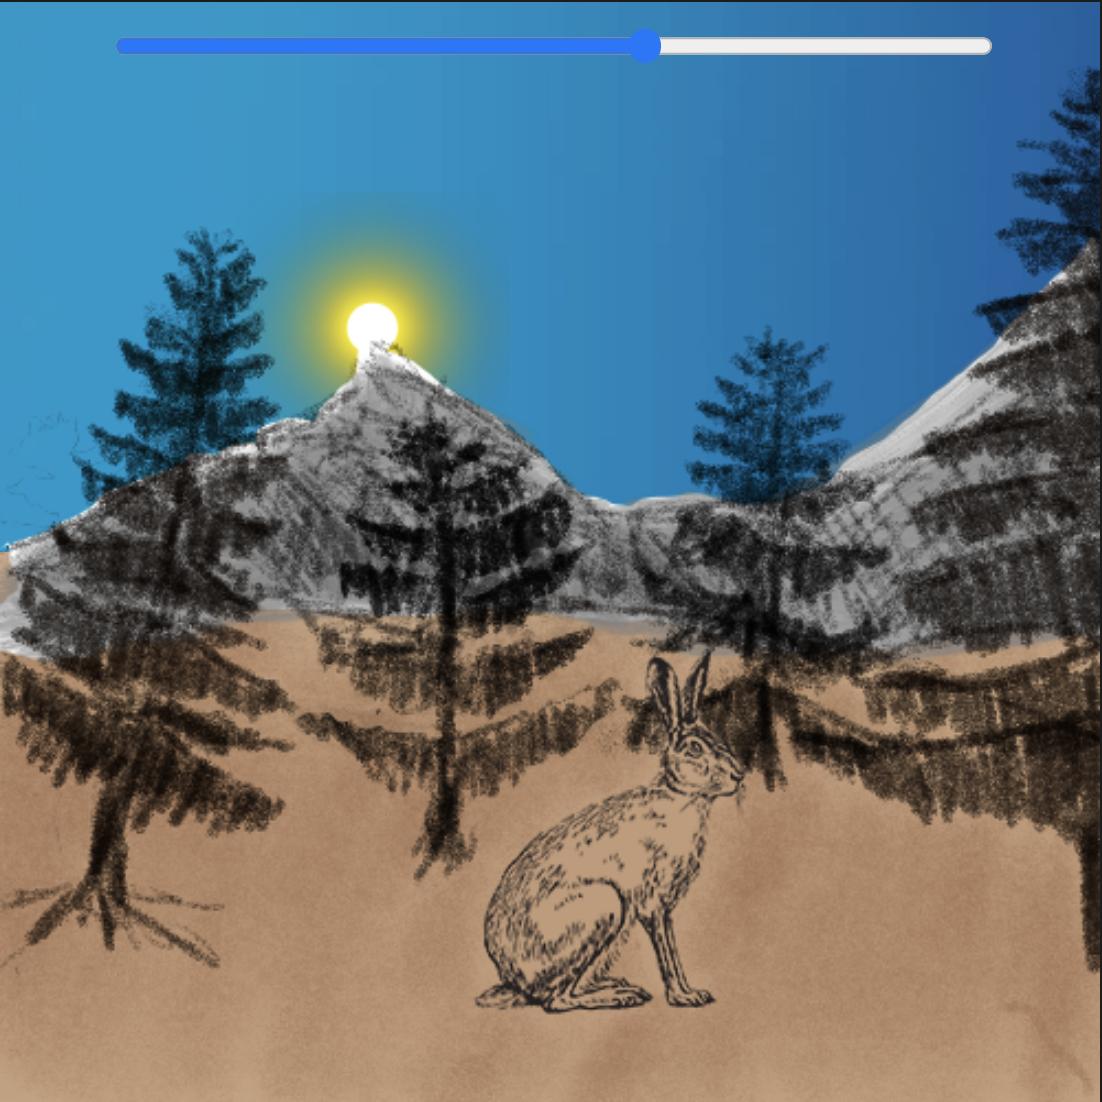 Screen Shot - Snowshoe Hares Timeless Coat (aka Sketch 1)